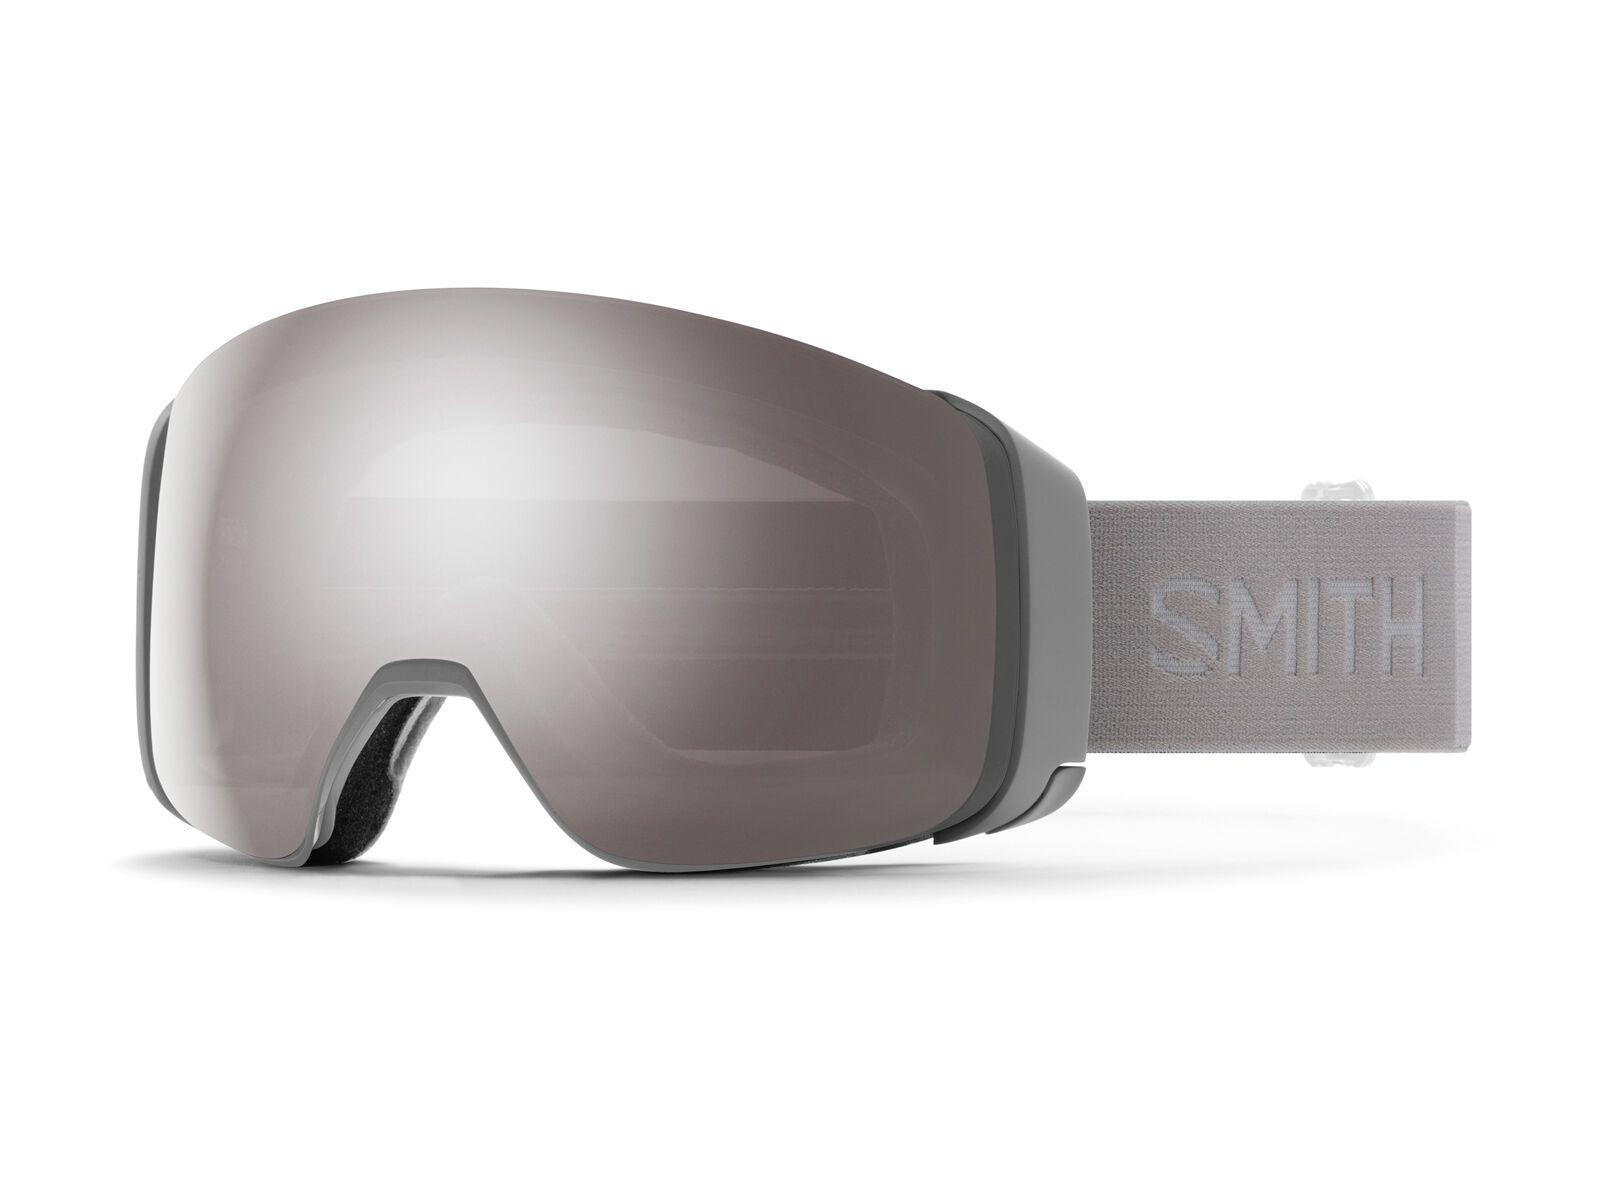 Smith 4D Mag inkl. WS, cloud grey/Lens: cp sun platinum mir - Skibrille M007322R6995T